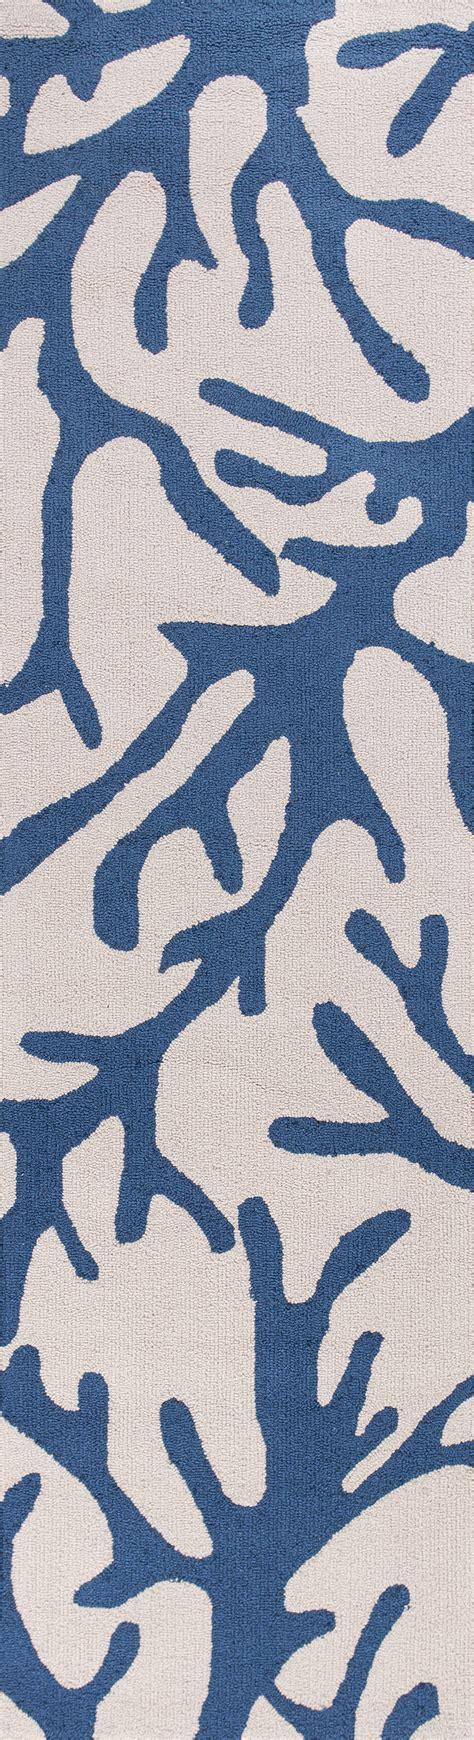 blue and coral rug kas sonesta 2037 ivory blue coral area rug